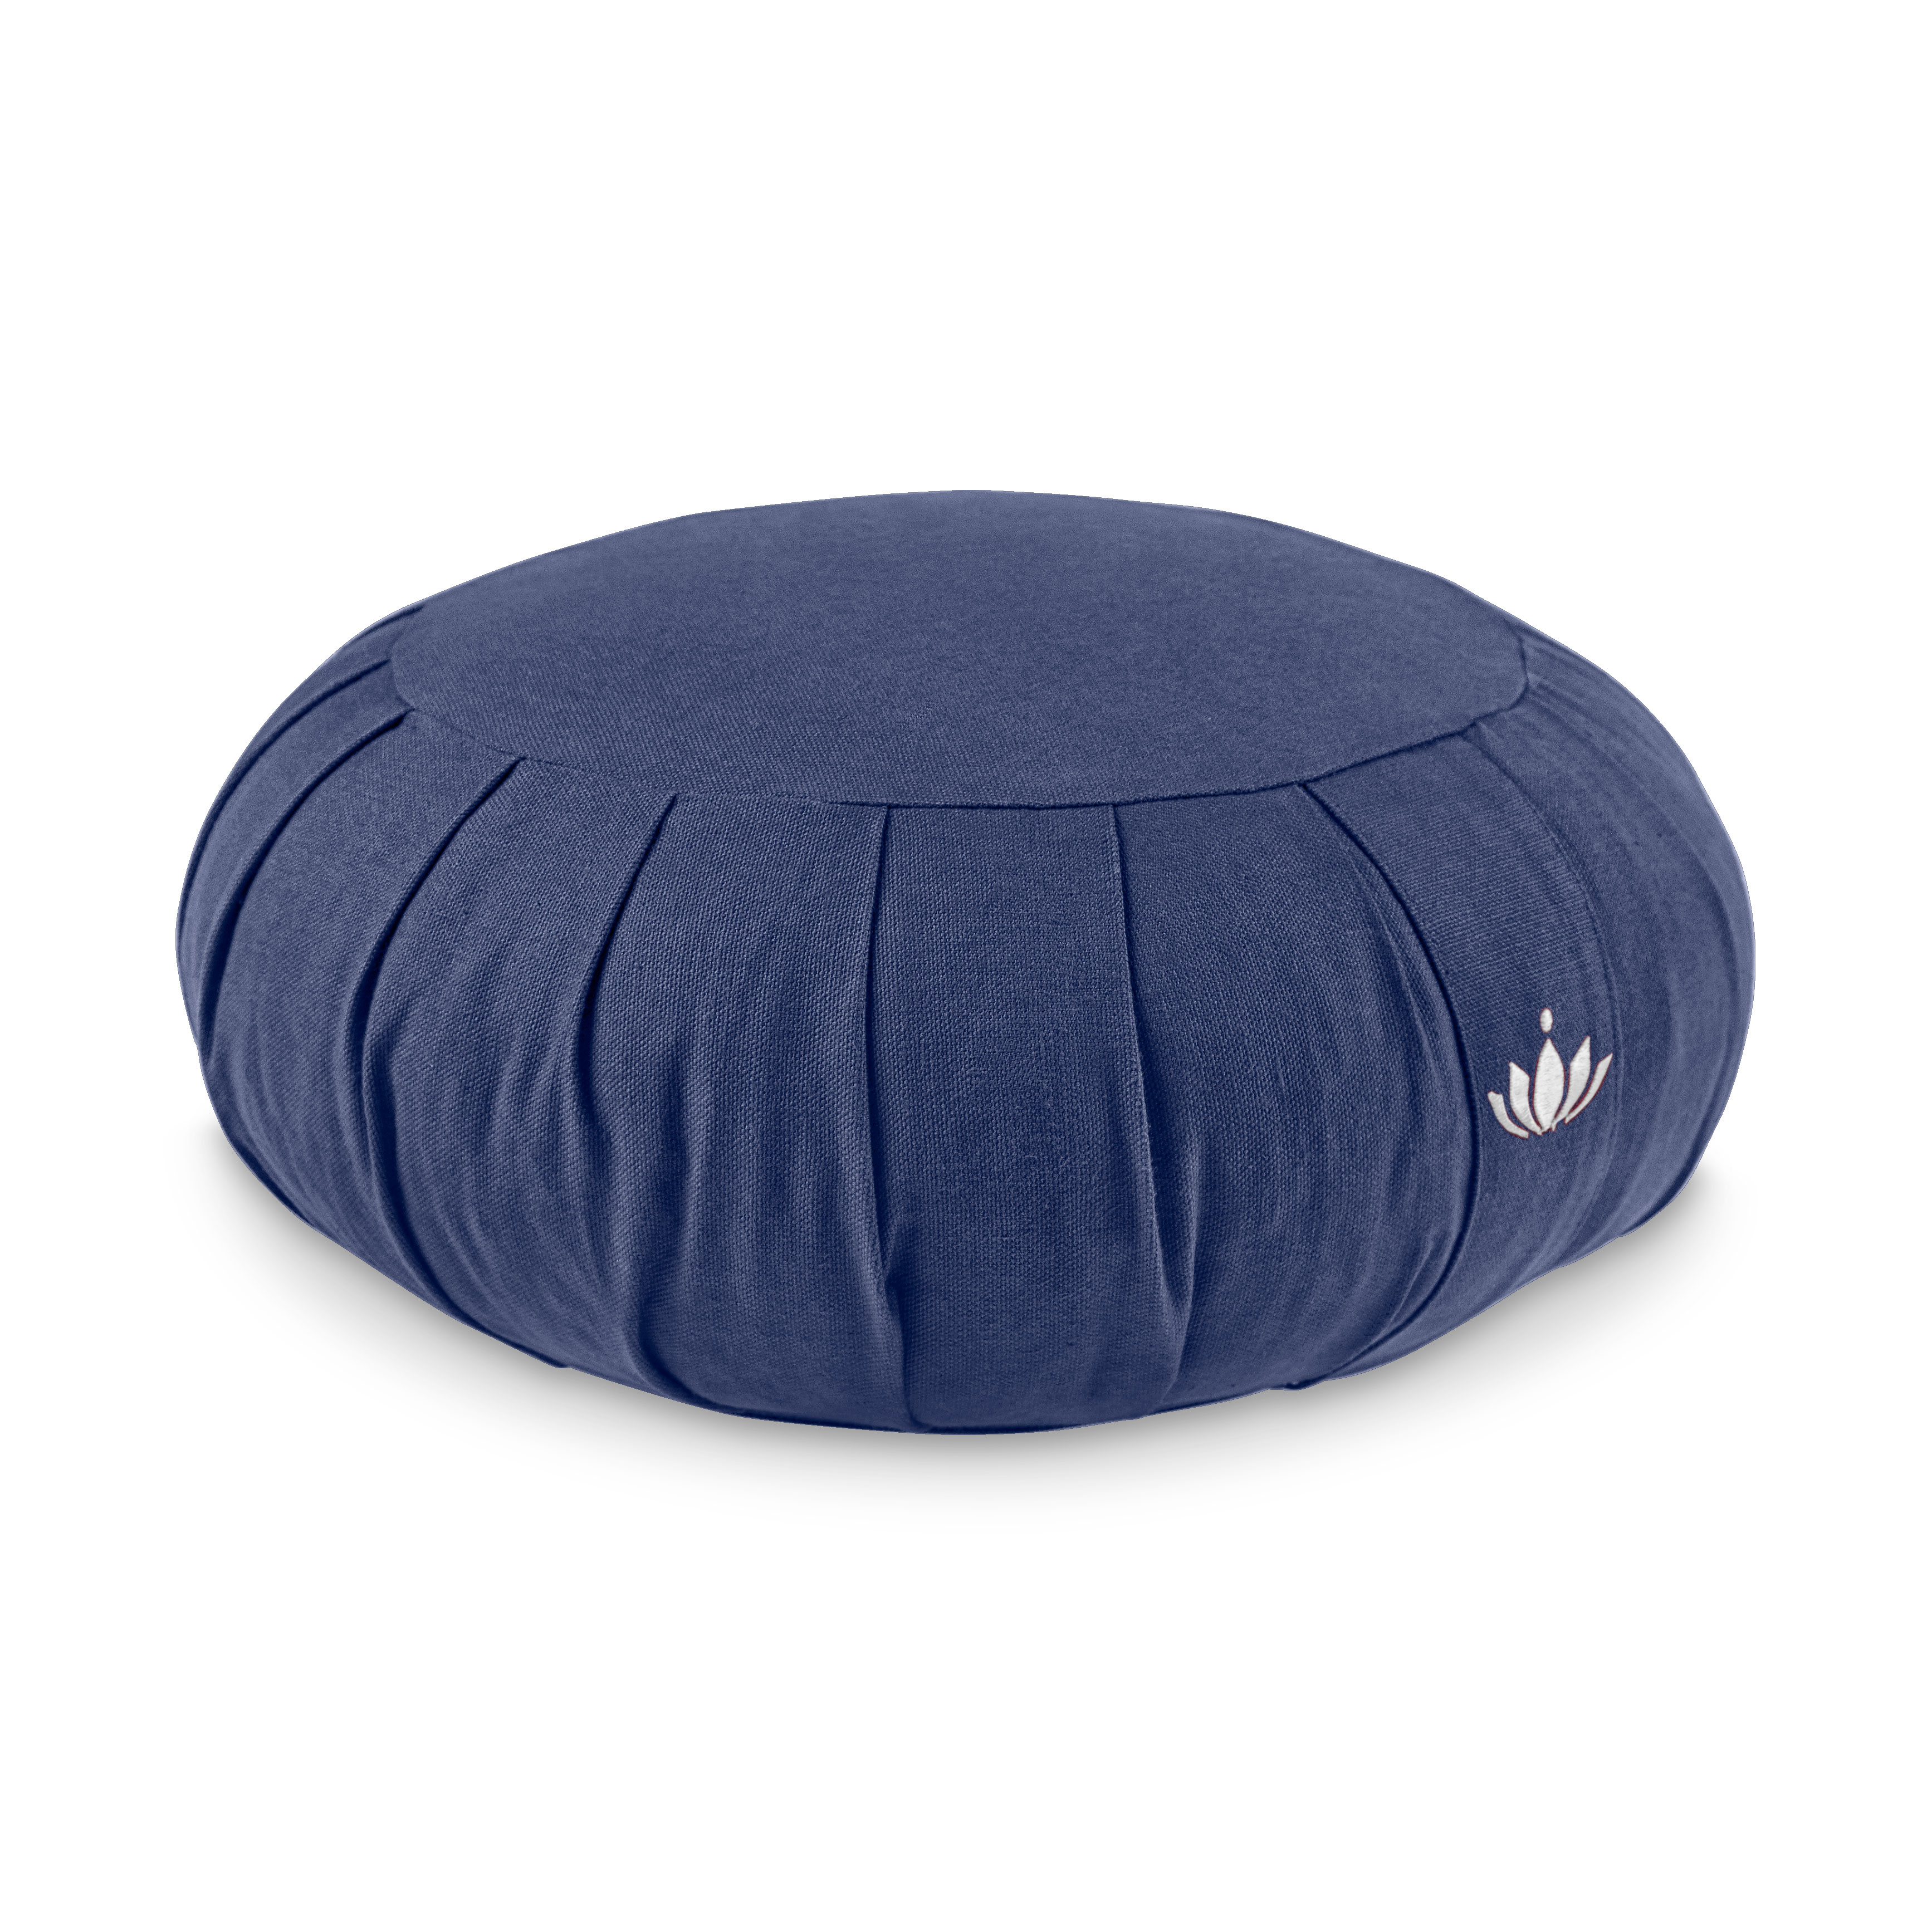 Meditation pude / Zafu - Royal Blue